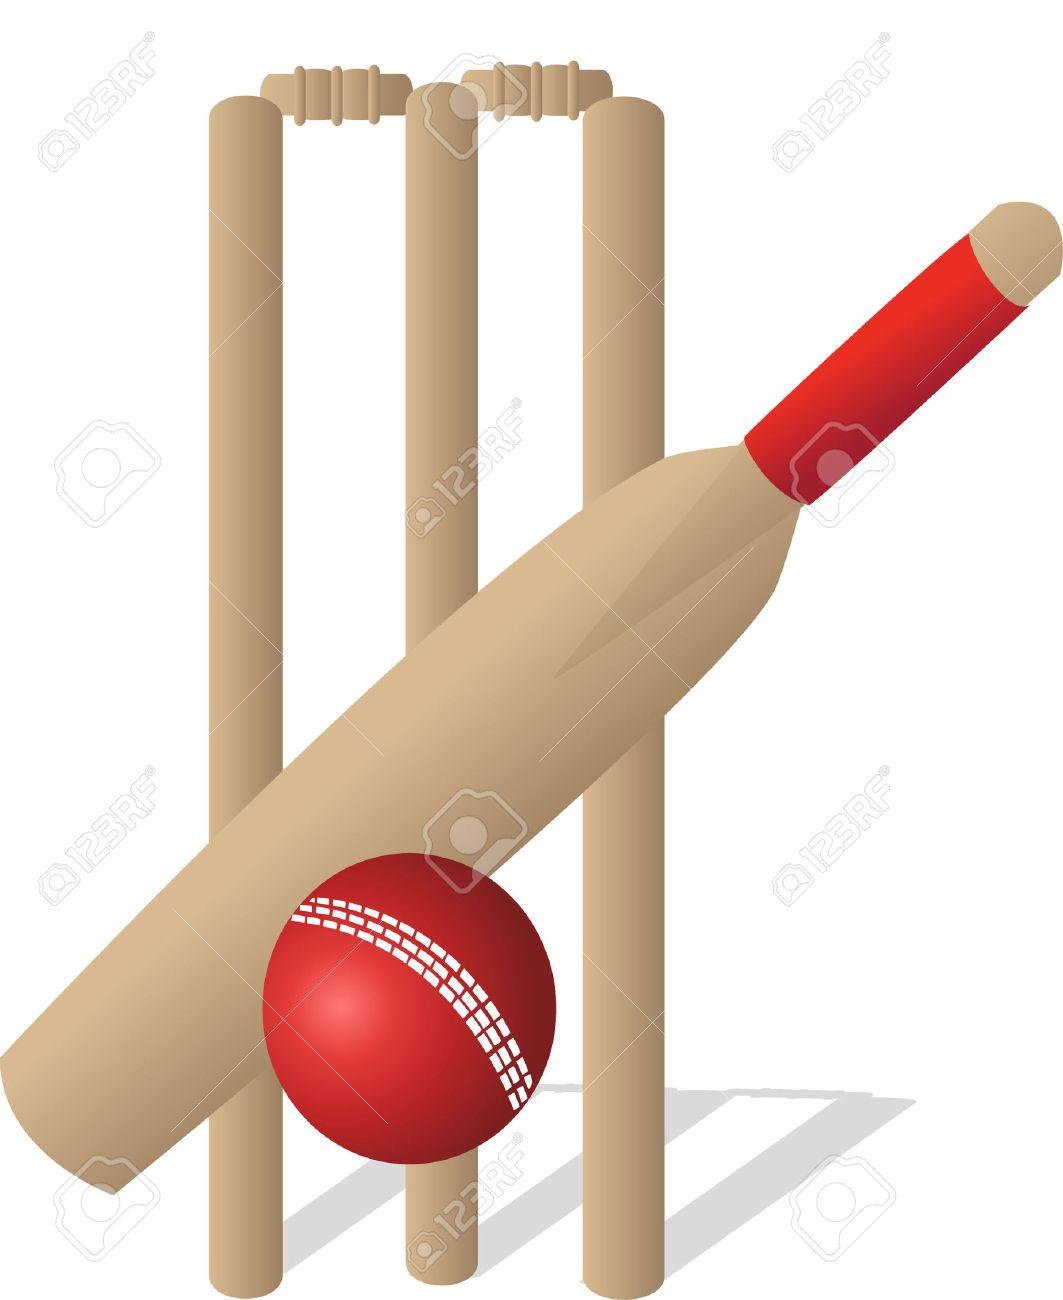 And ball a cricket. Bat clipart boll